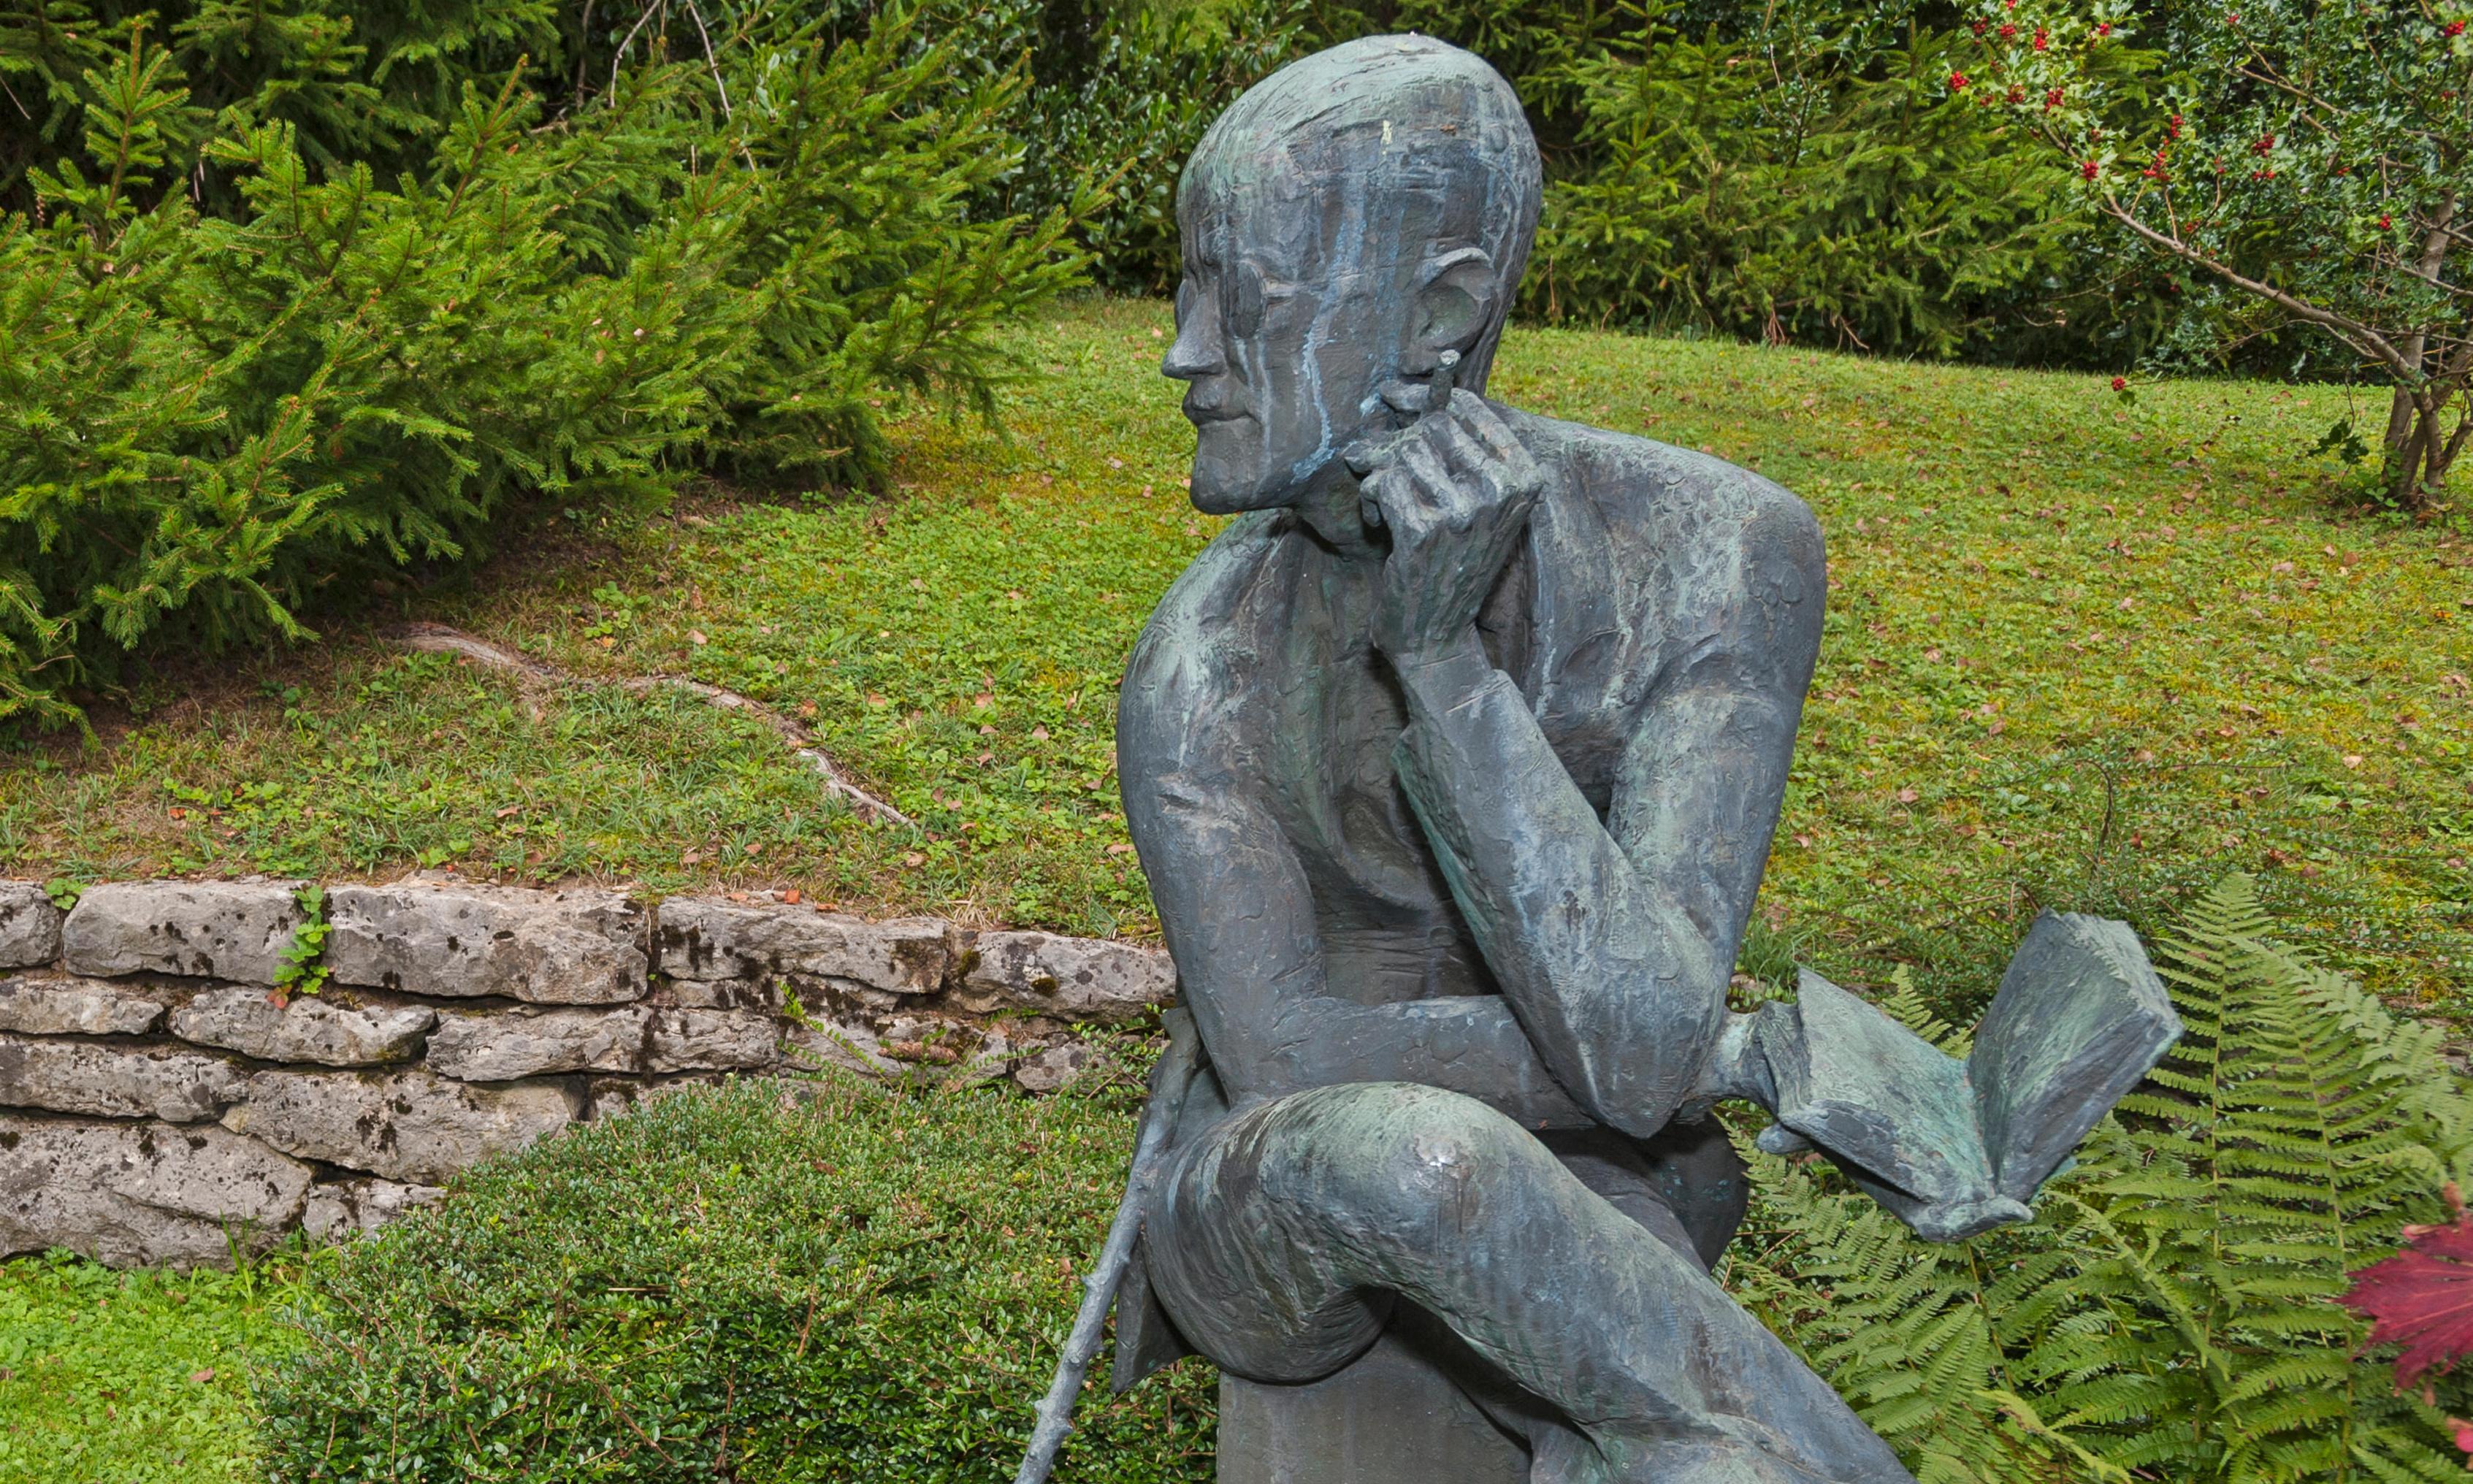 Bid to repatriate James Joyce's remains ahead of Ulysses centenary